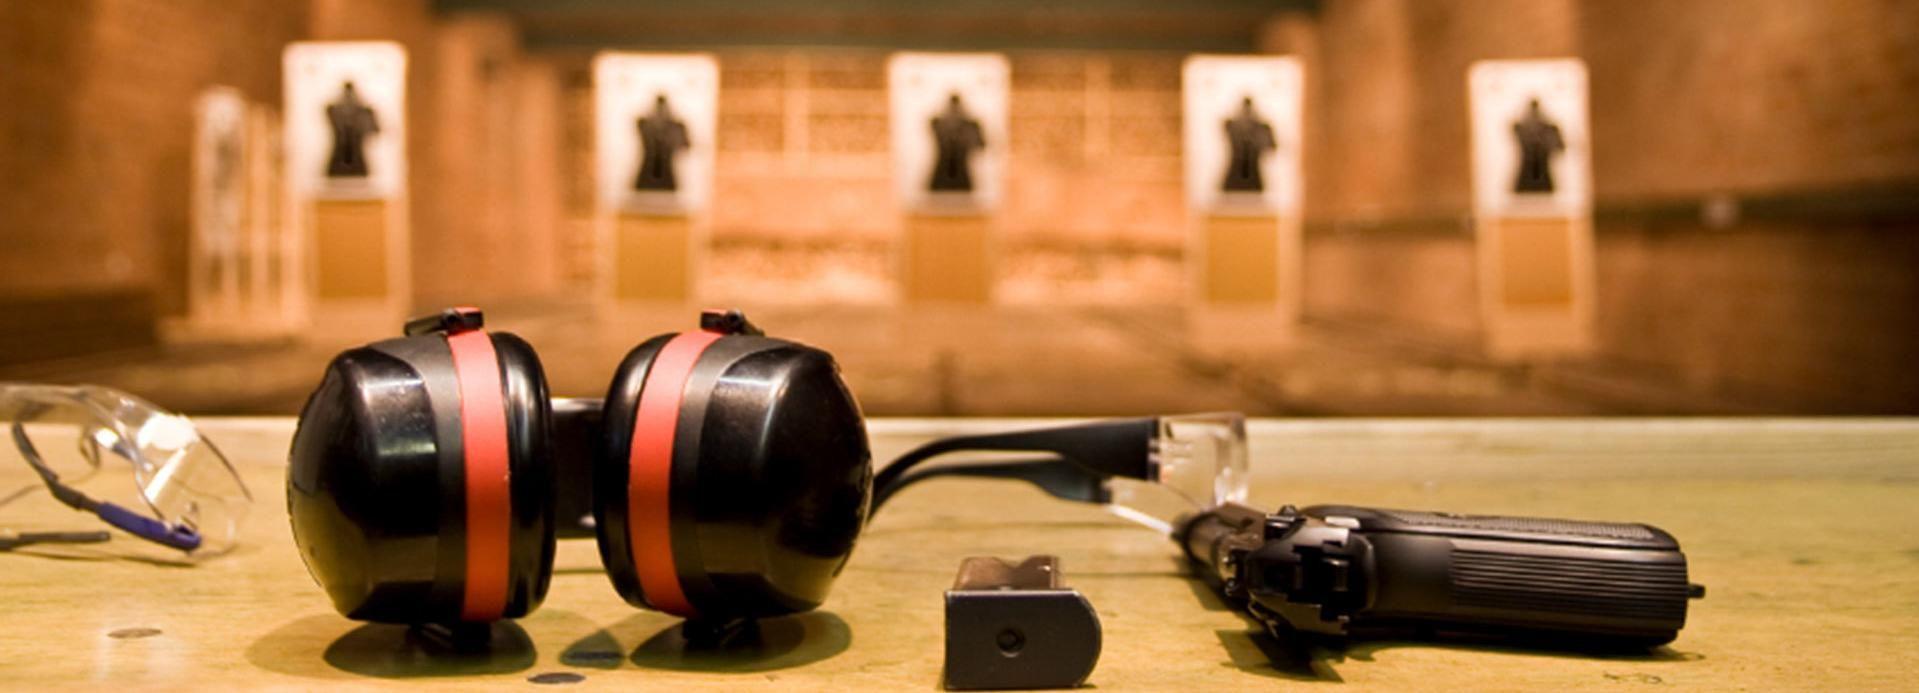 Kiev: Indoor Shooting Range Experience